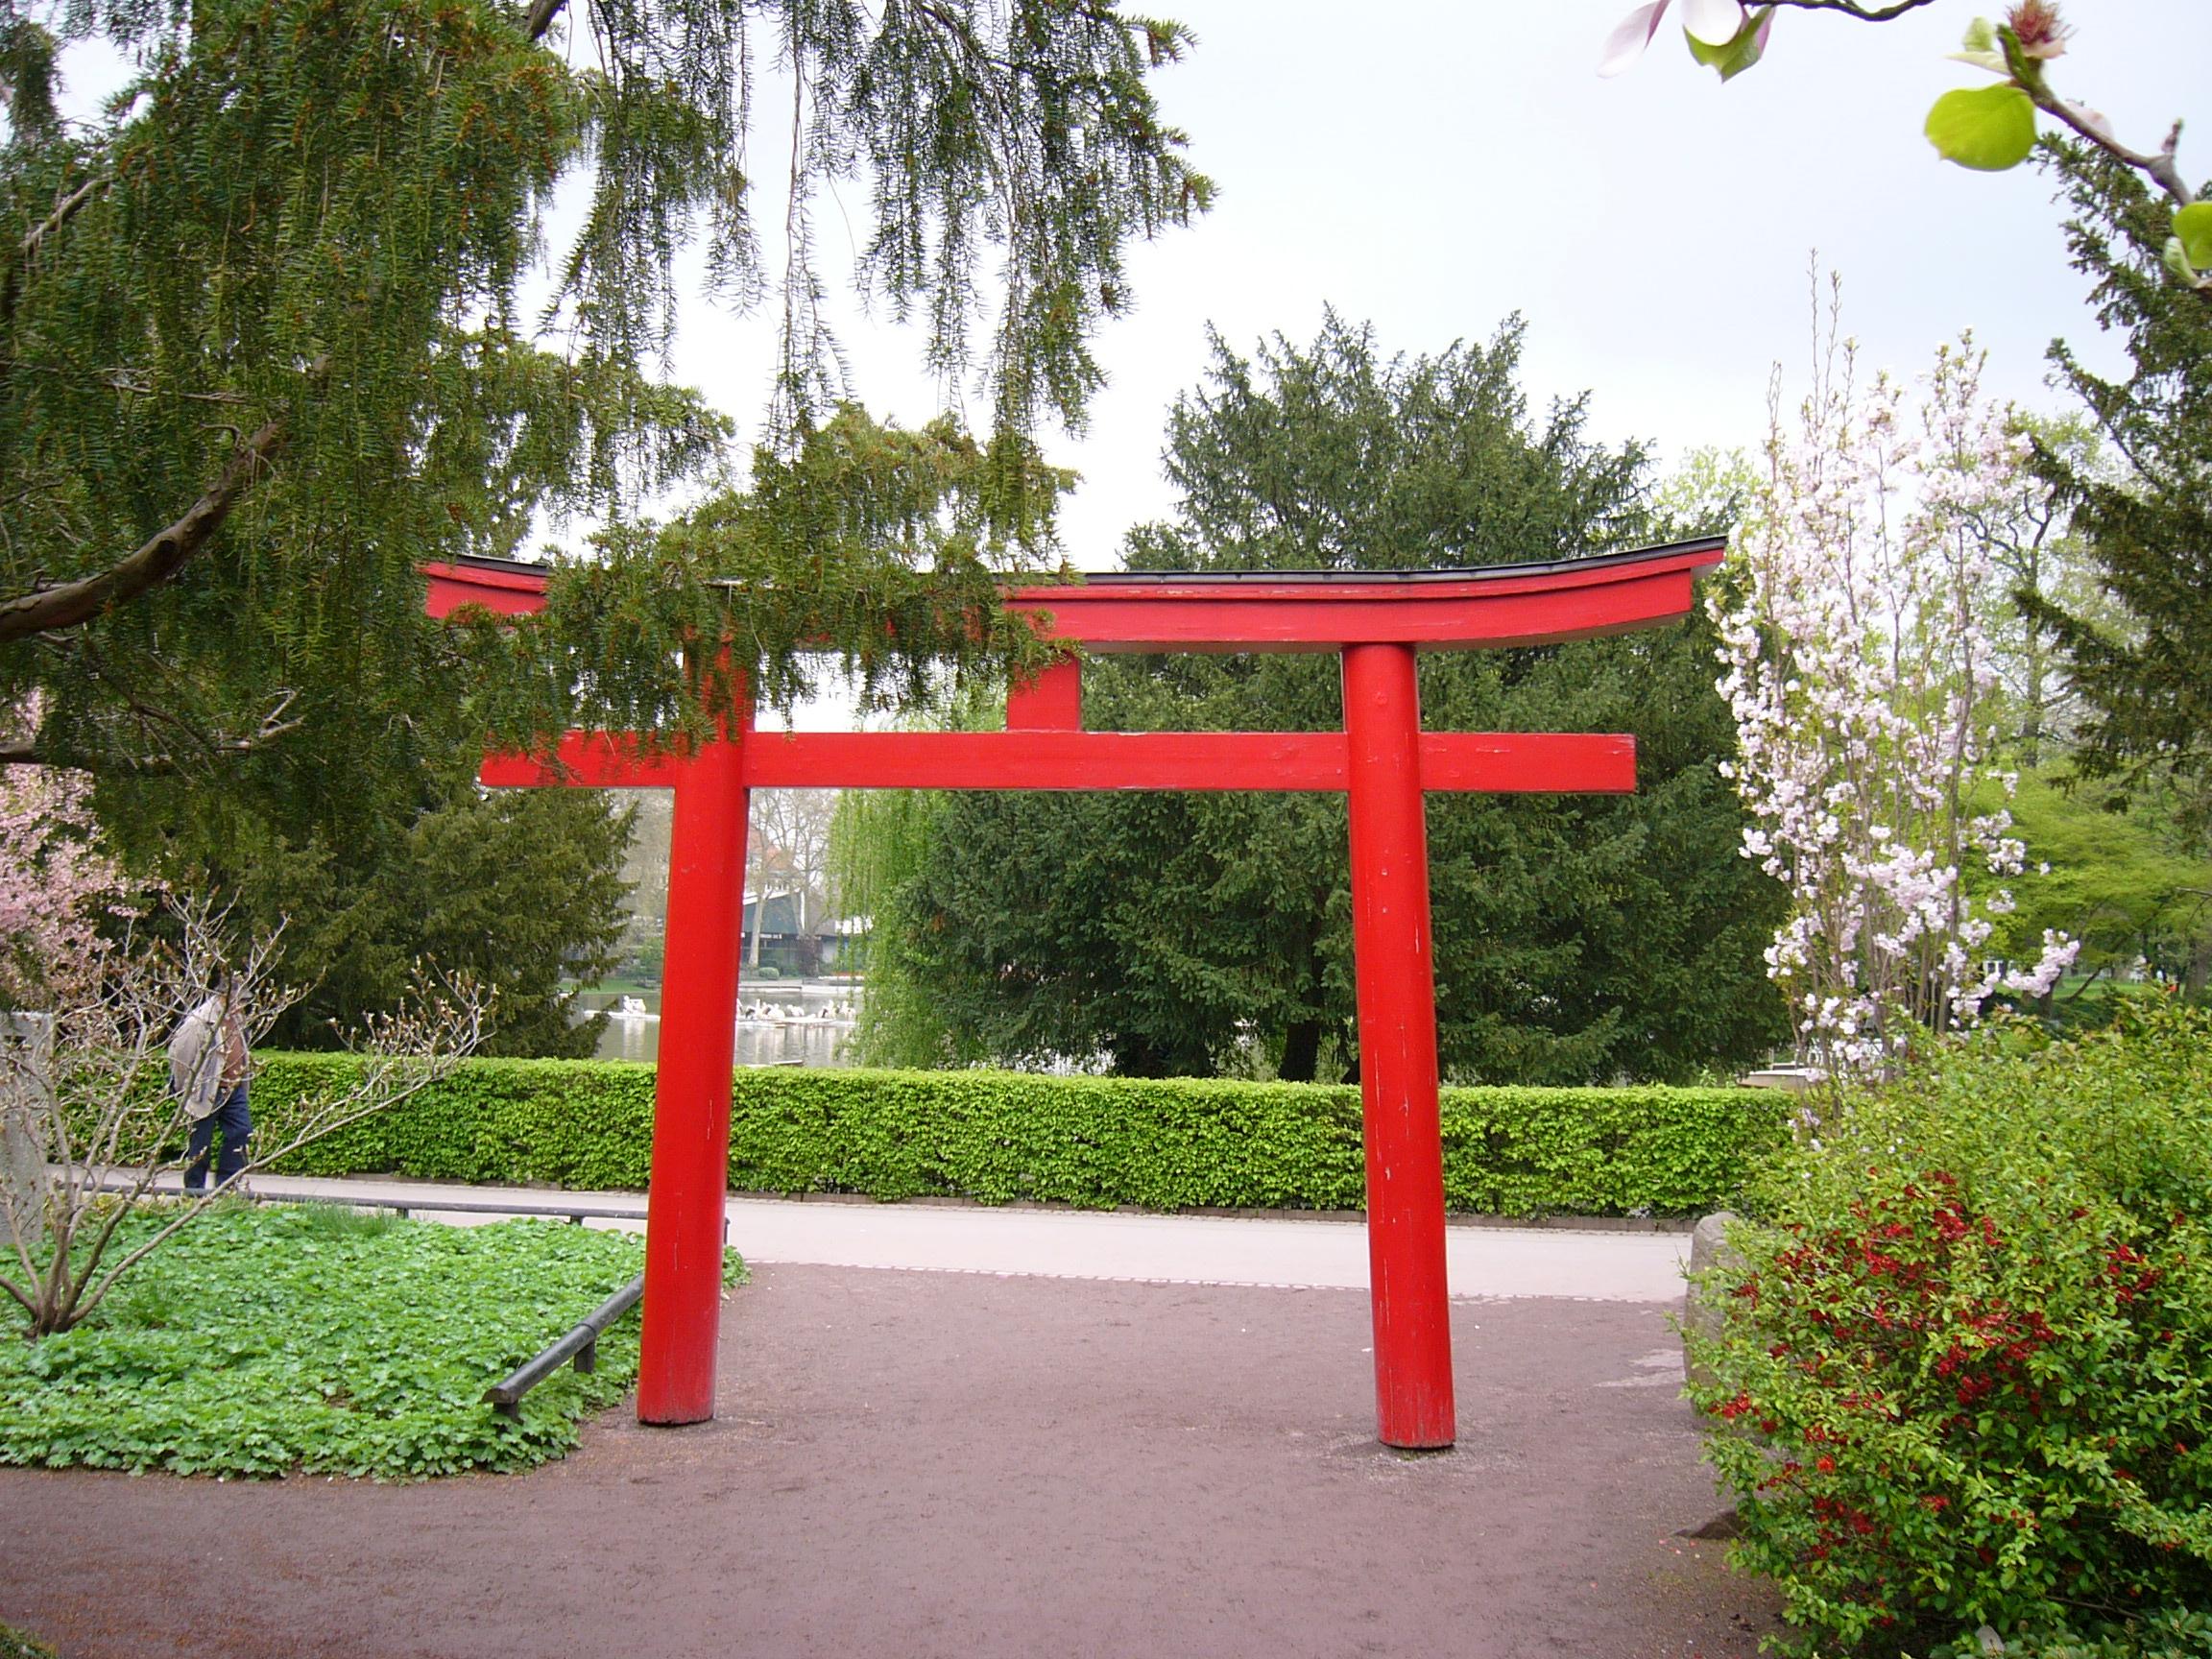 Image Japanese arch